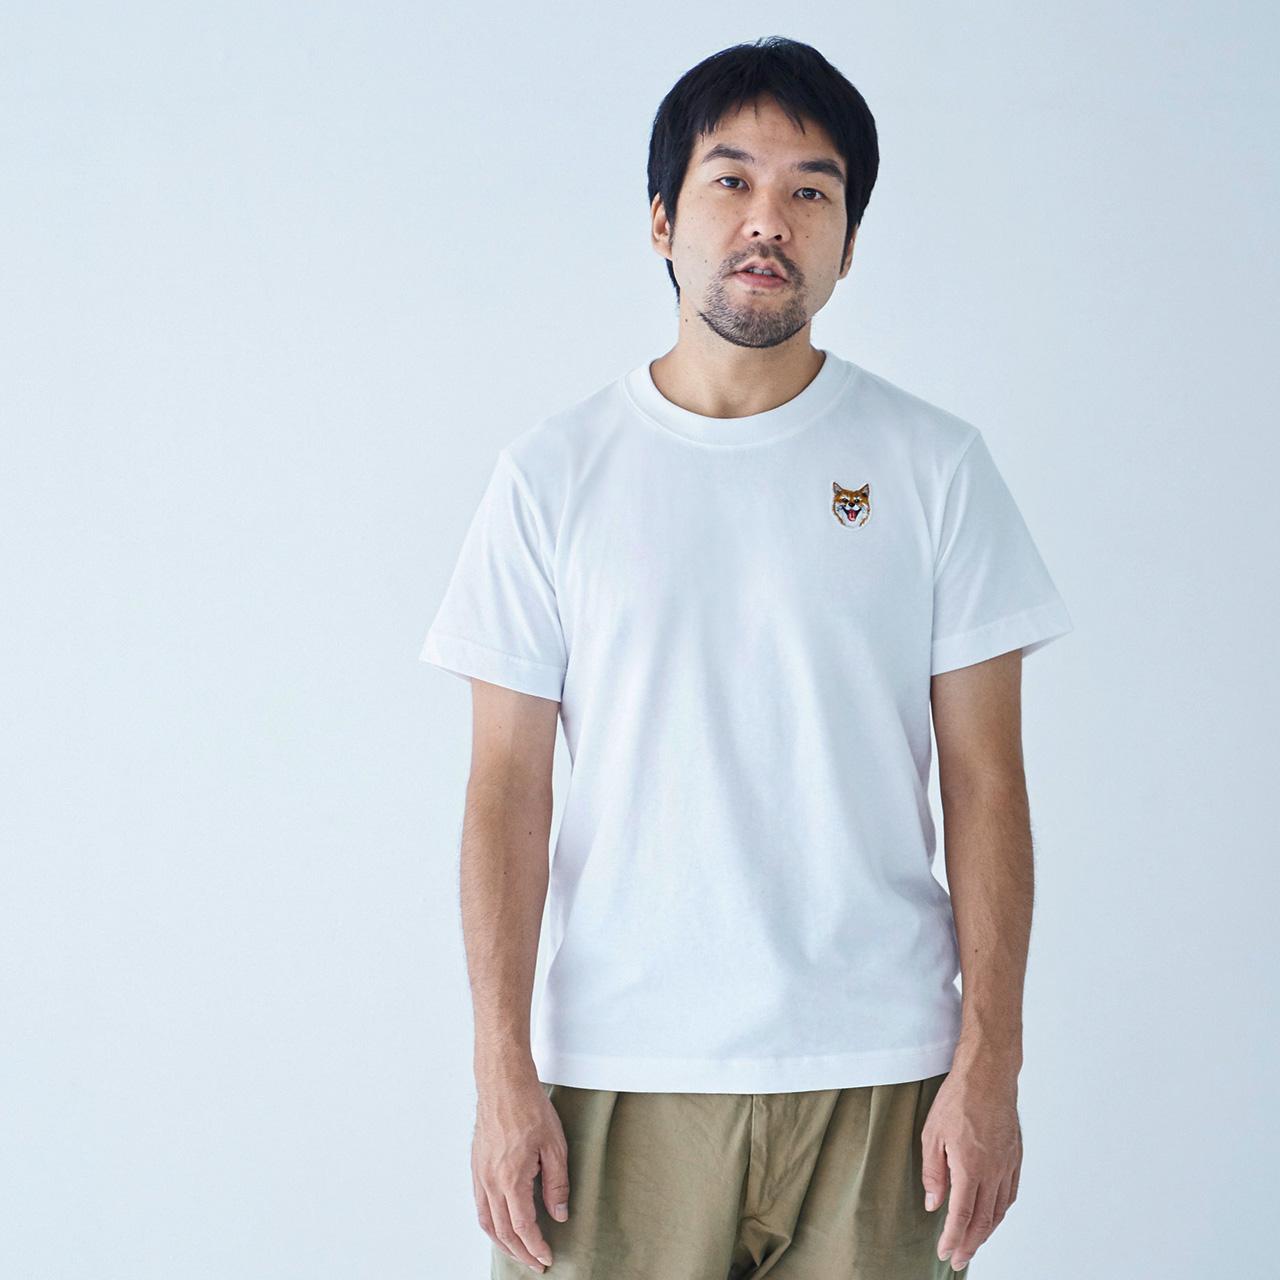 tee shirt smile patch white for man shibe japan